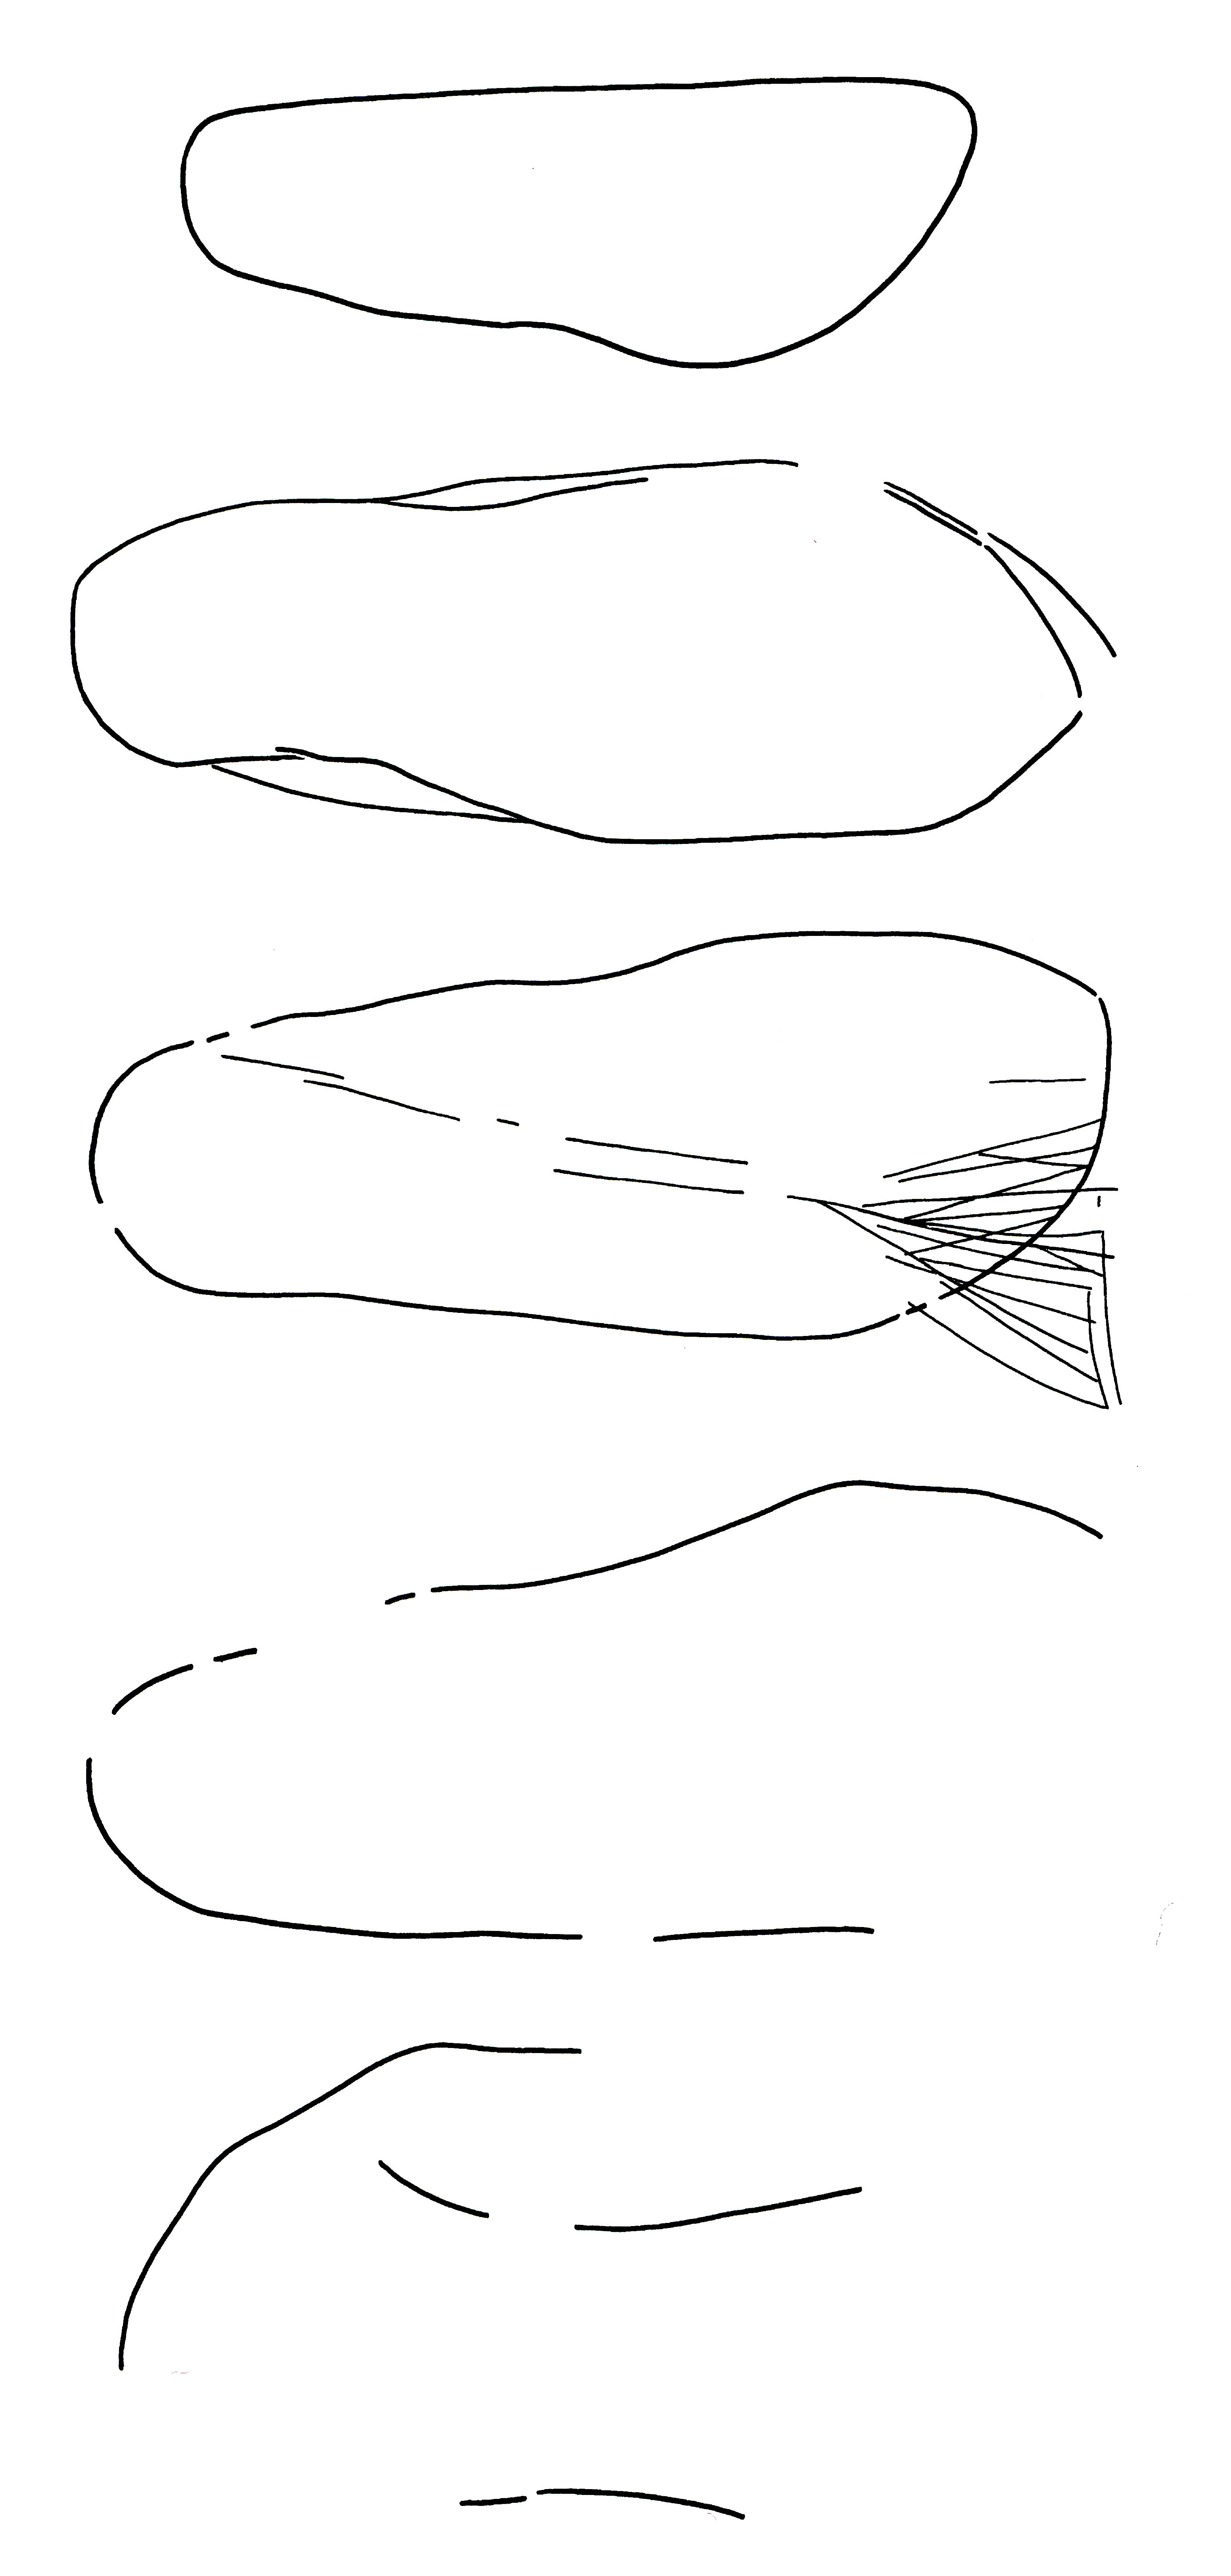 fig-1-large